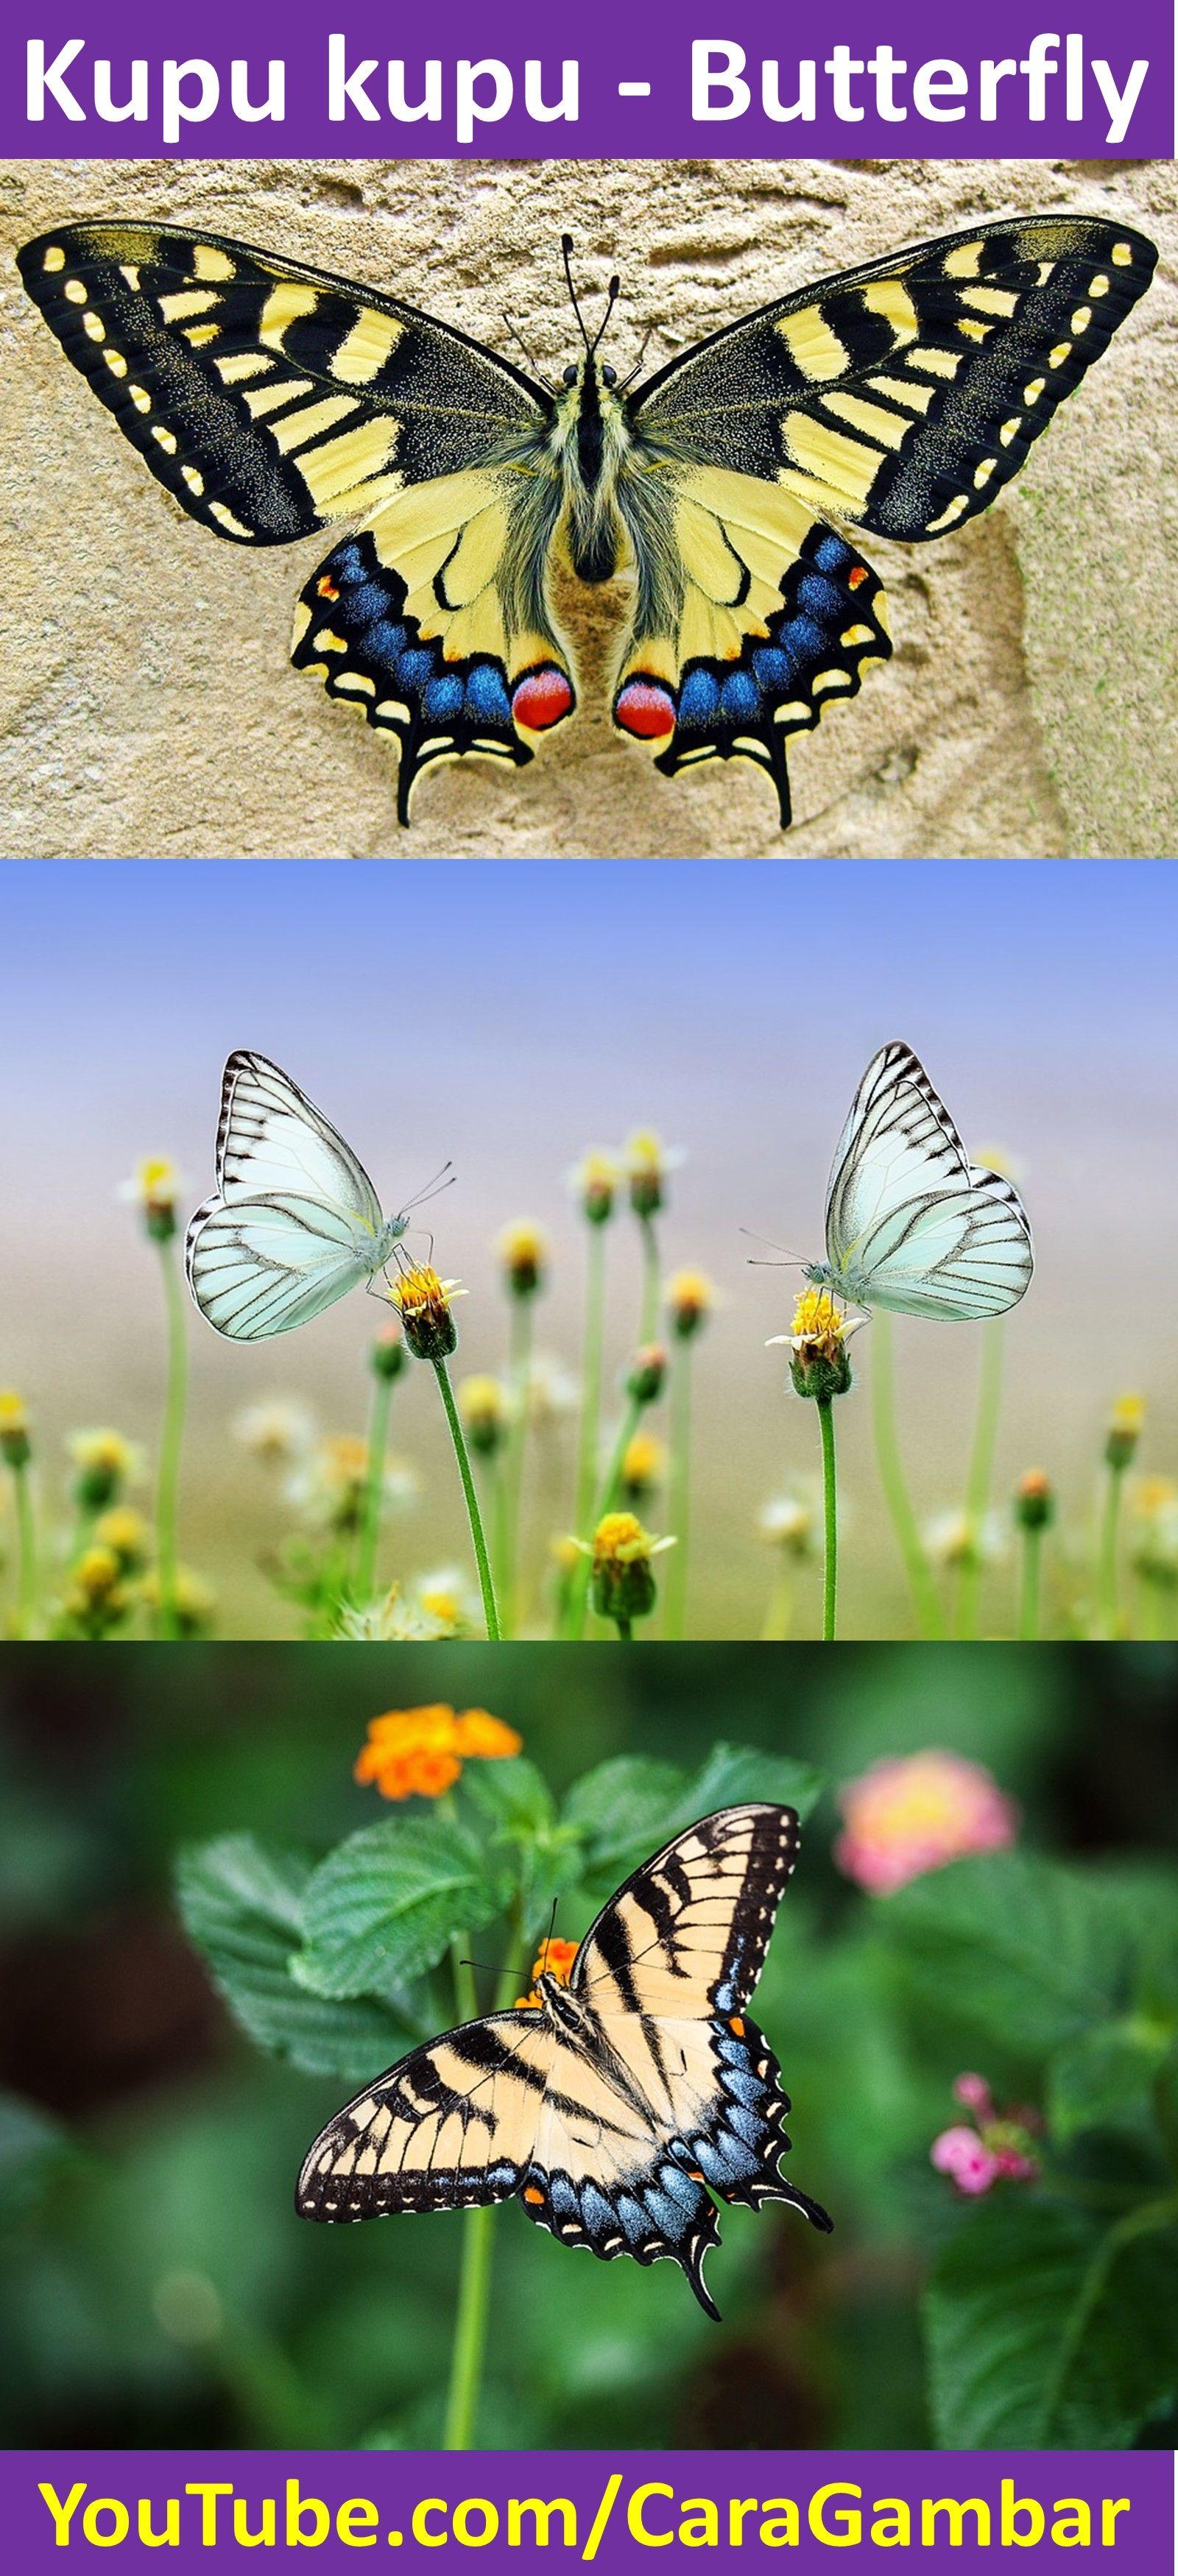 73 Koleksi Gambar Binatang Kupu Kupu HD Terbaik